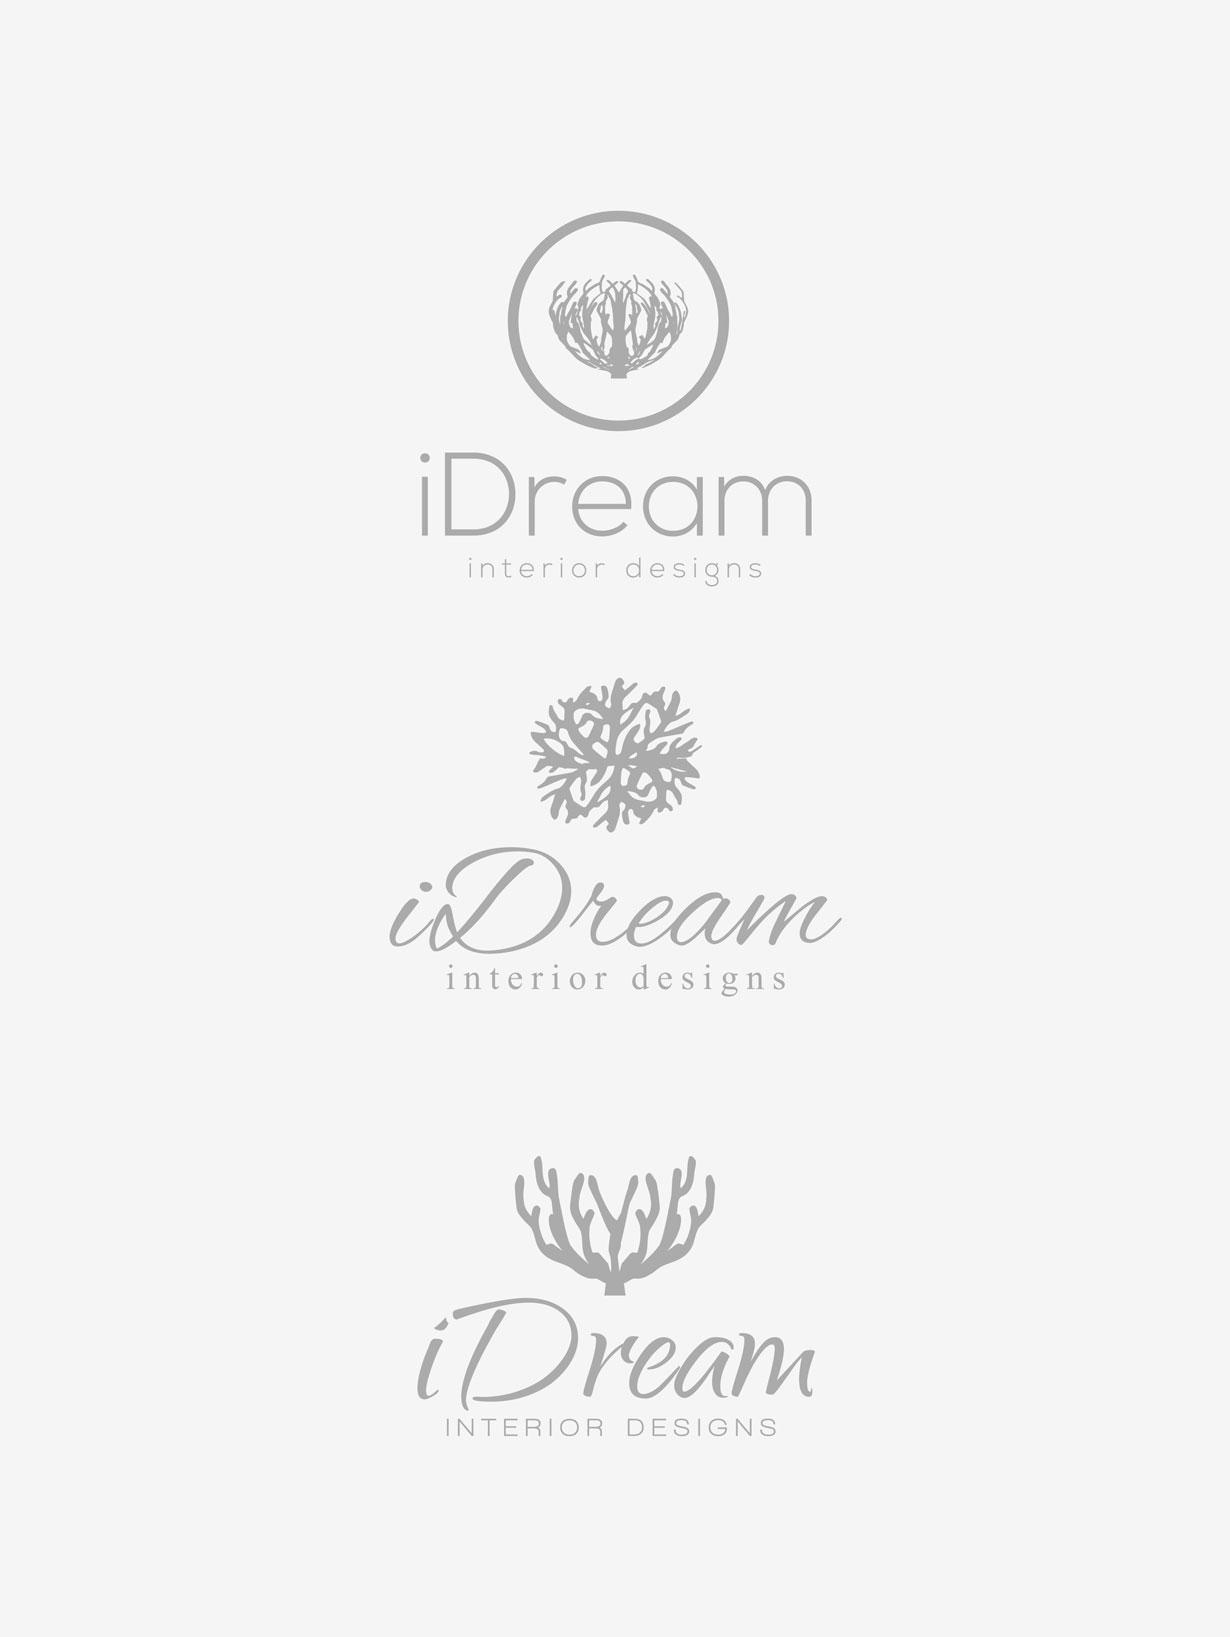 iDream-Interior-Designs-Logo-Concepts.jpg